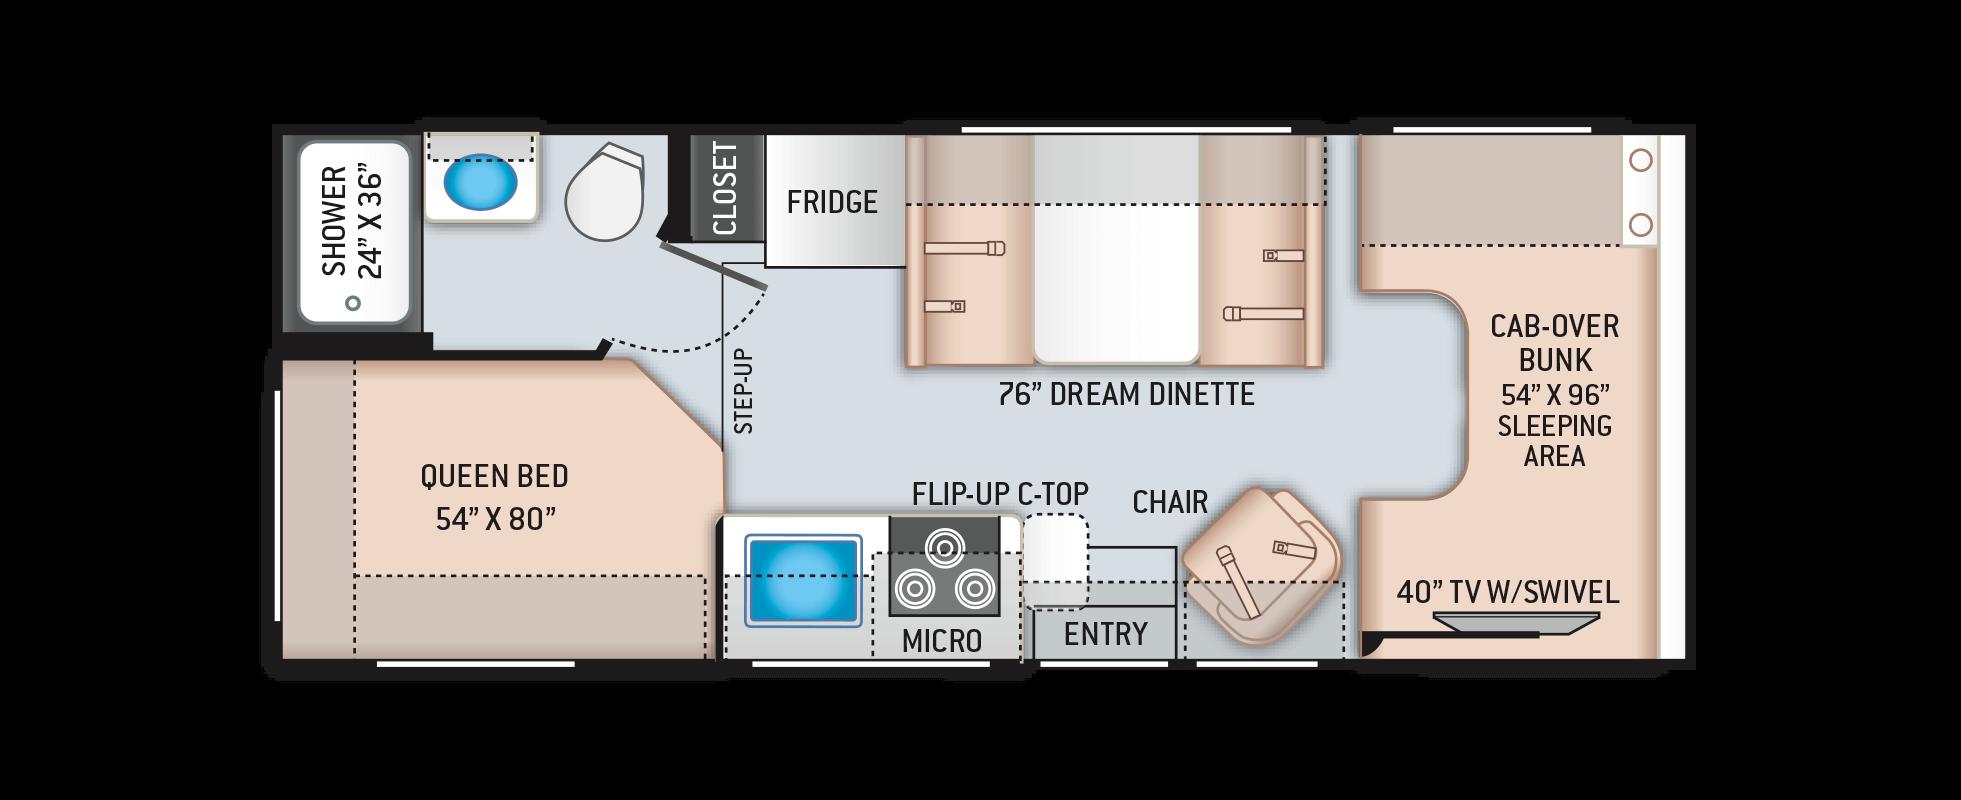 Freedom Elite Class C Motorhomes Floor Plan 23h Thor